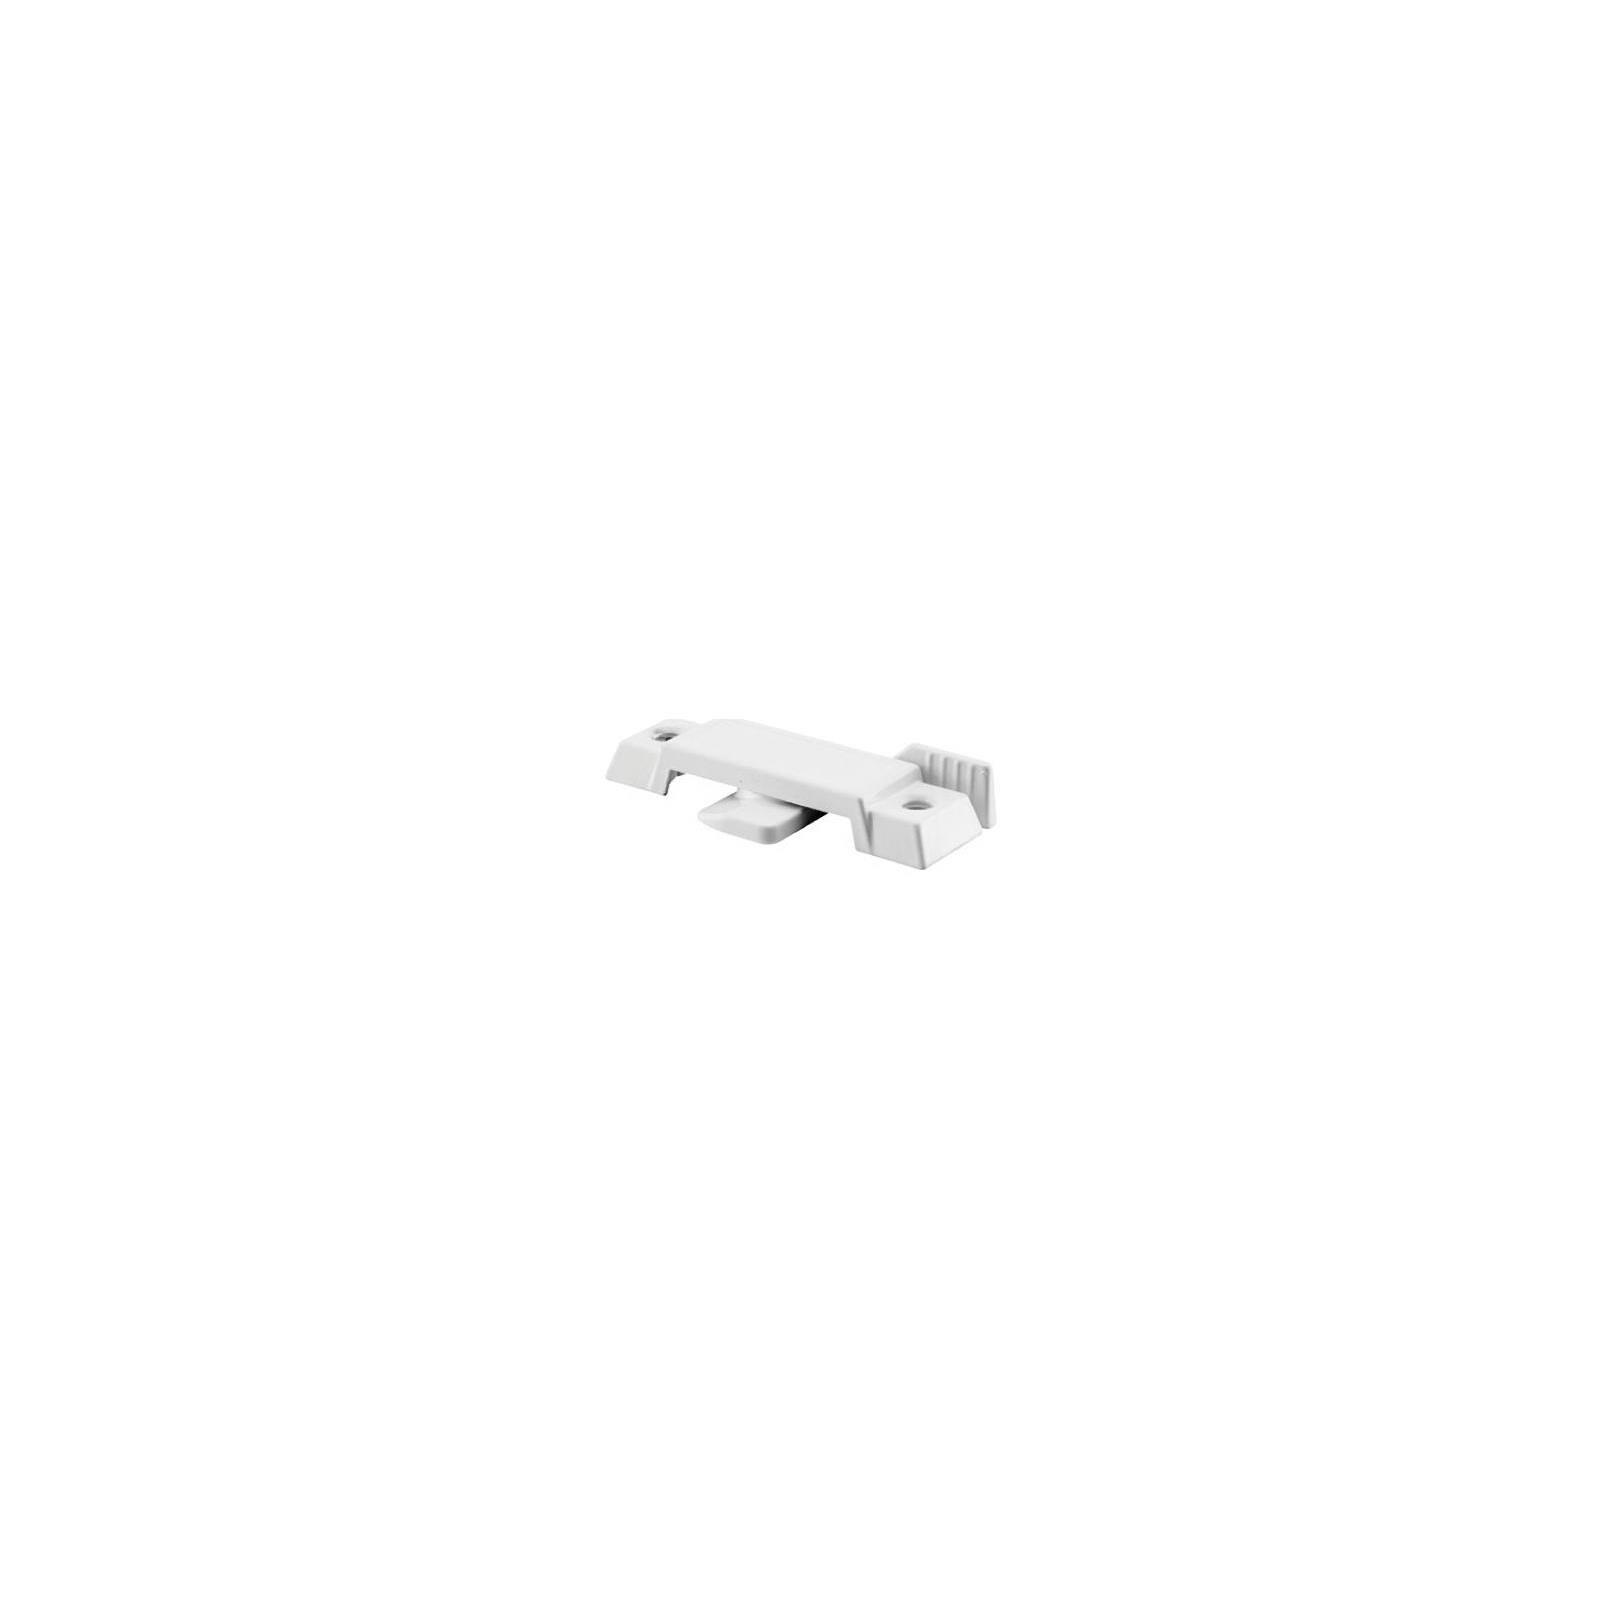 Prime-Line Sash Lock Vertical And Horizontal Sliding Windows 3/8'' Die-Cast White Finish Carded